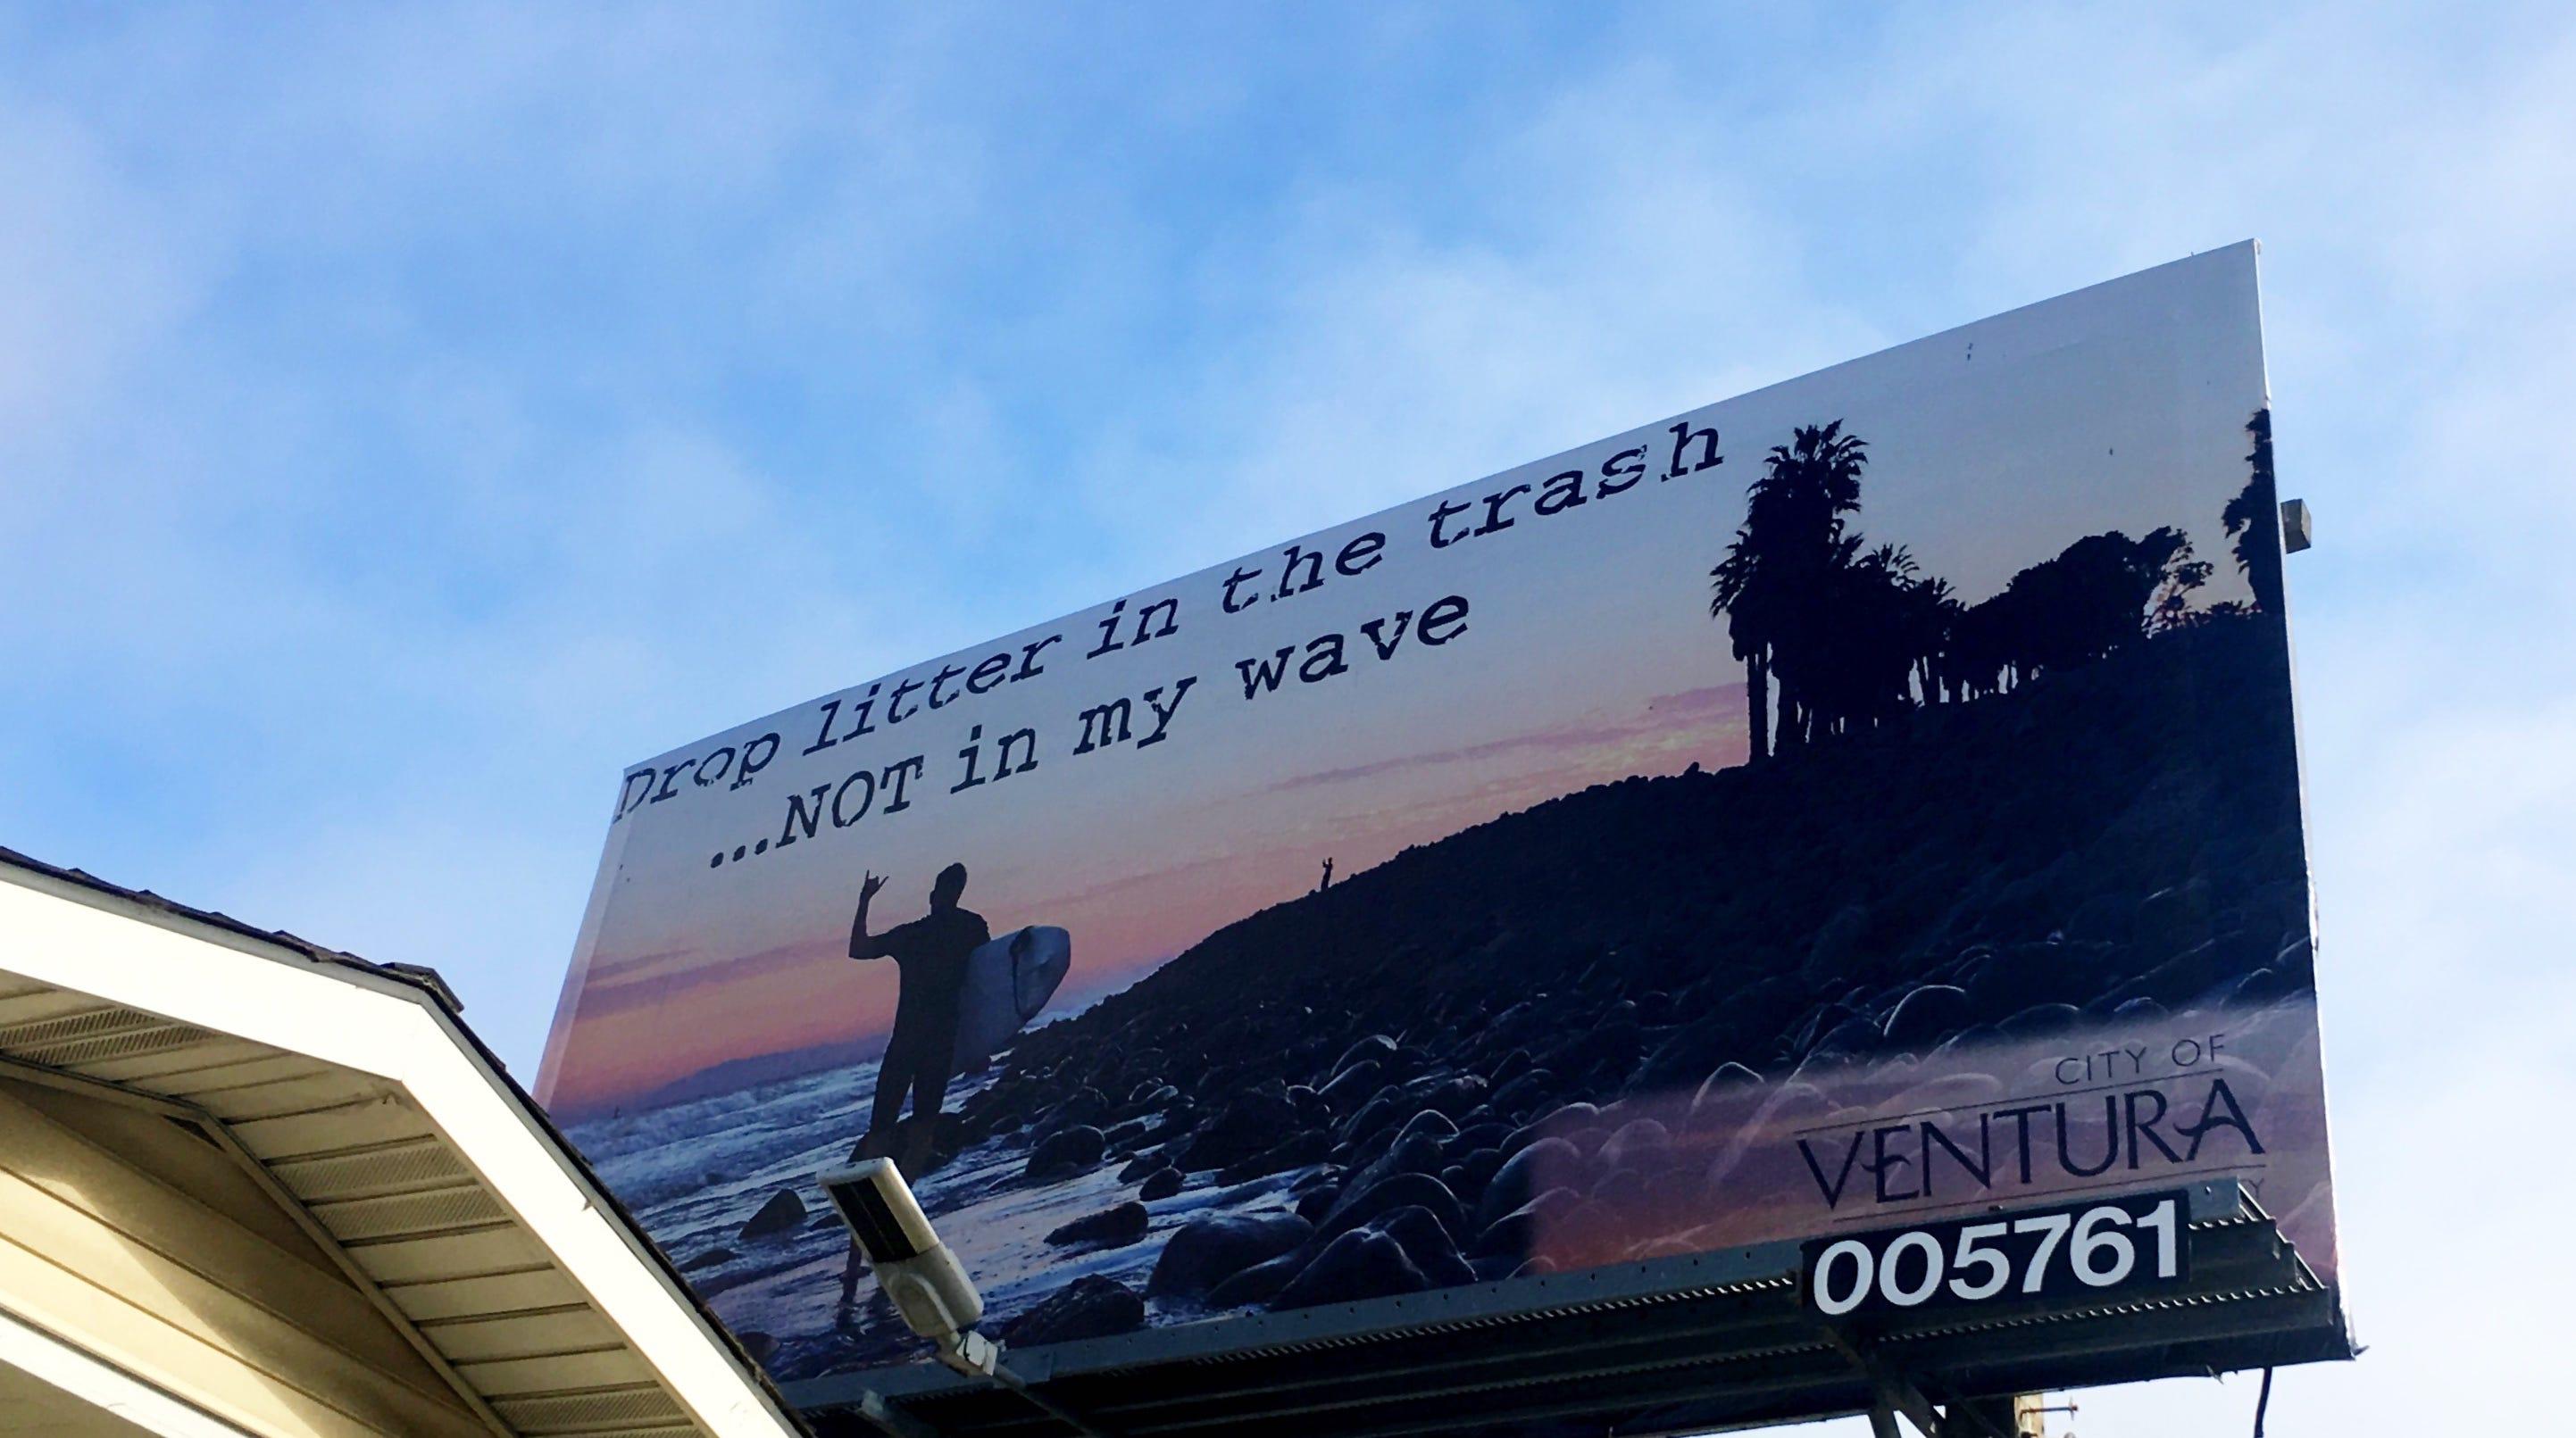 Ventura County marketing efforts lack inclusivity, critics say